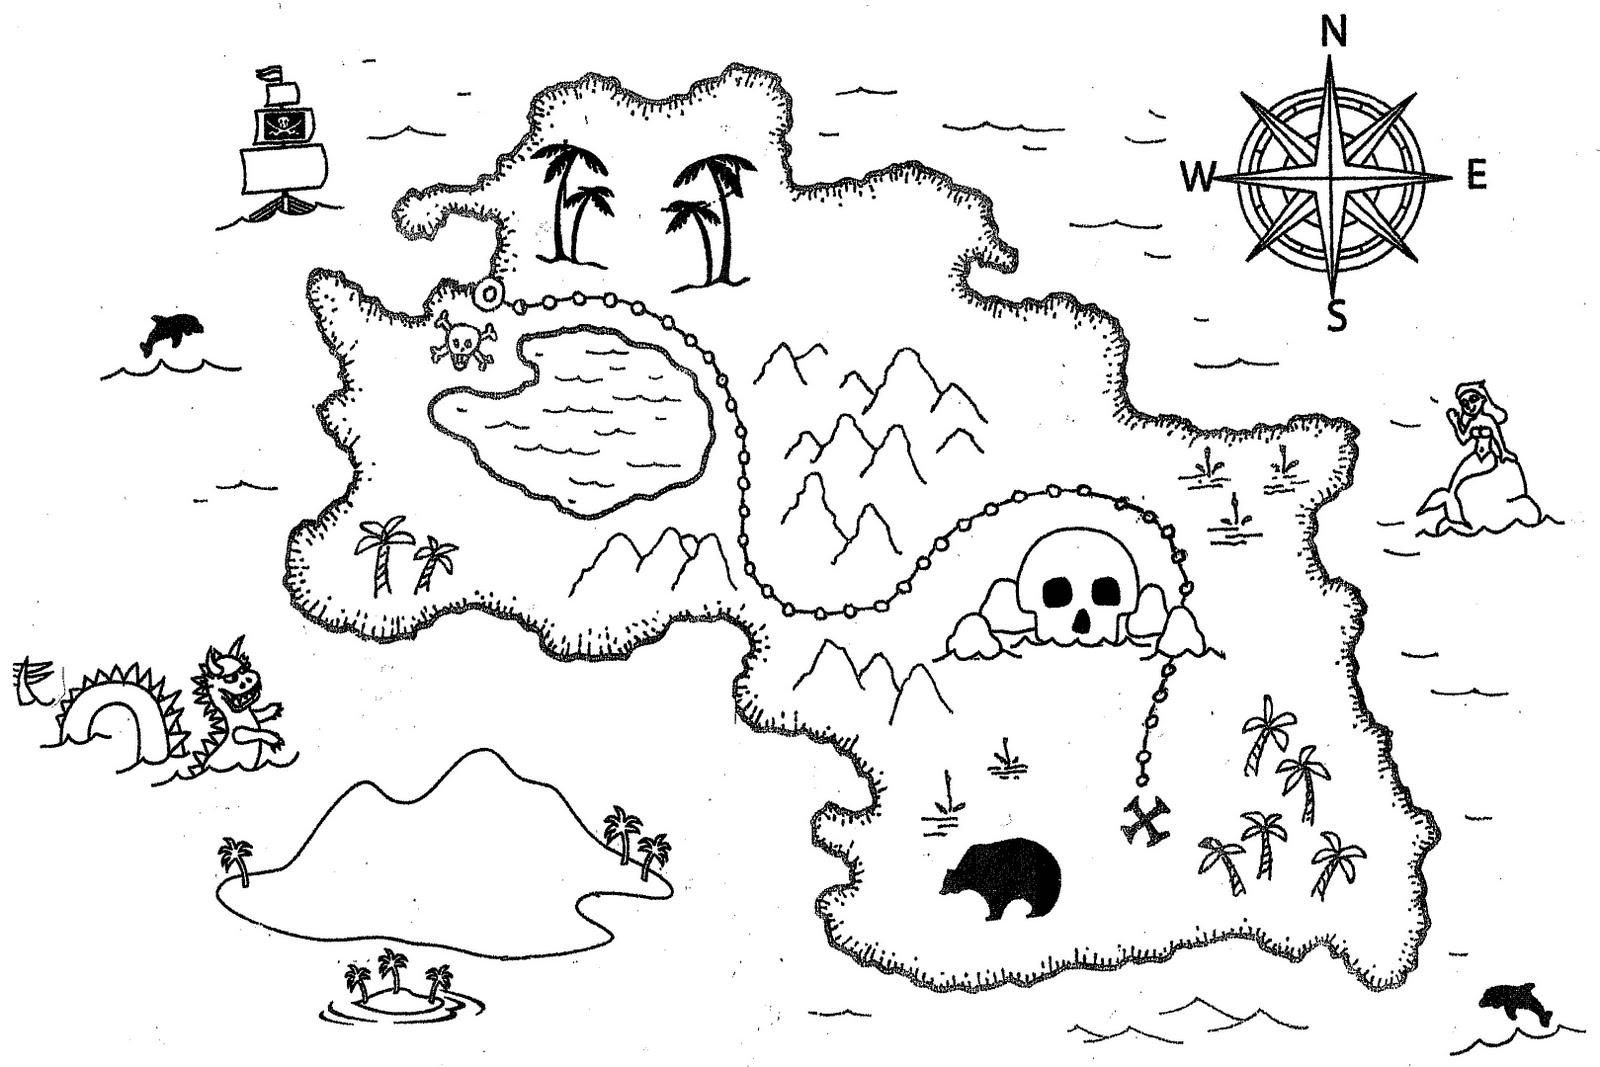 de ayudar al barco pirata a llegar a la isla del tesoro de familyfun